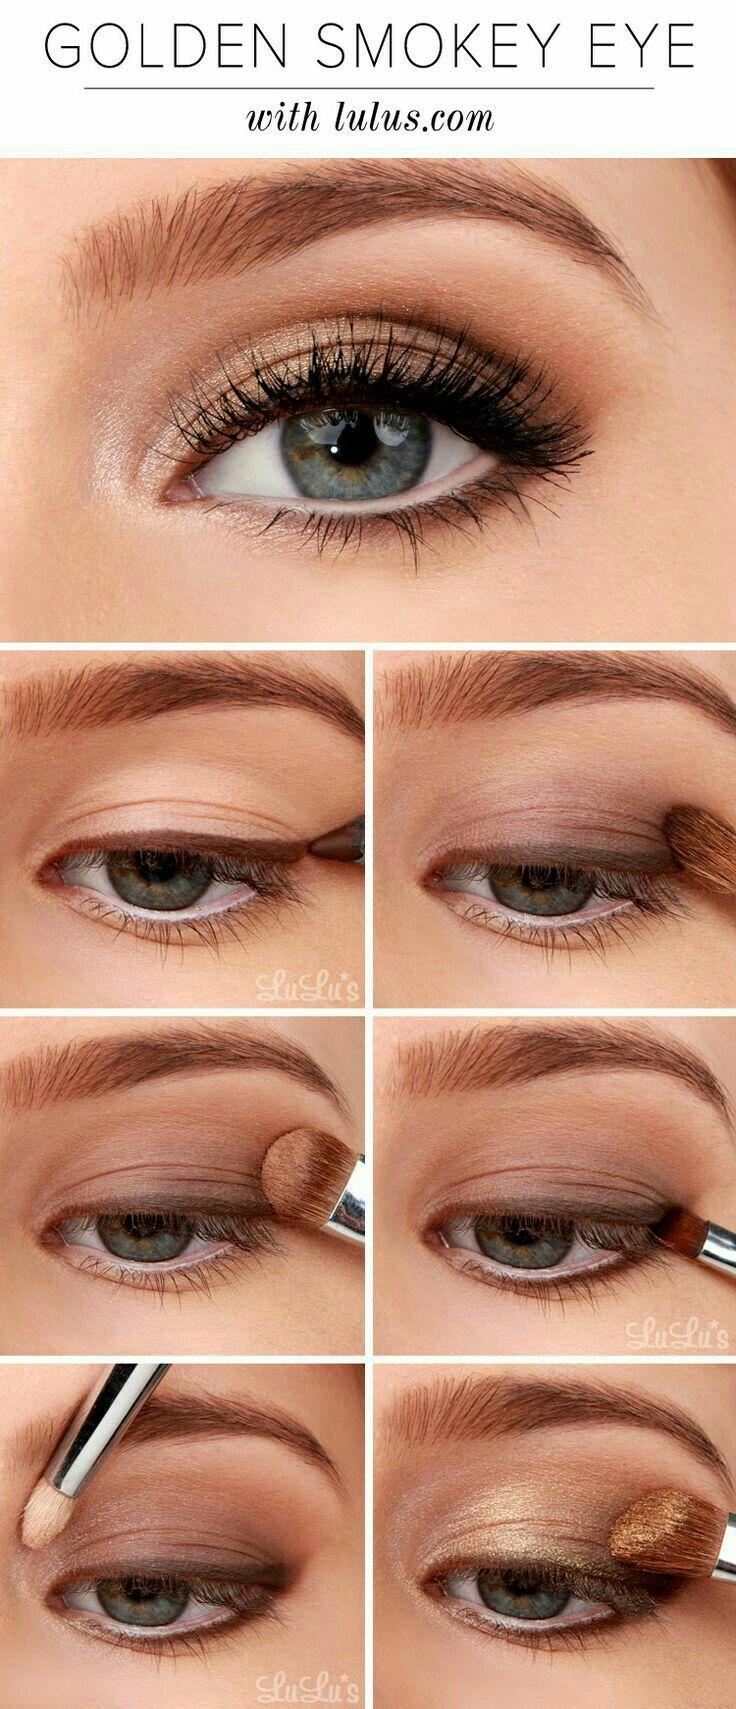 Golden Smokey Eye Make-up Tutorial! :-)